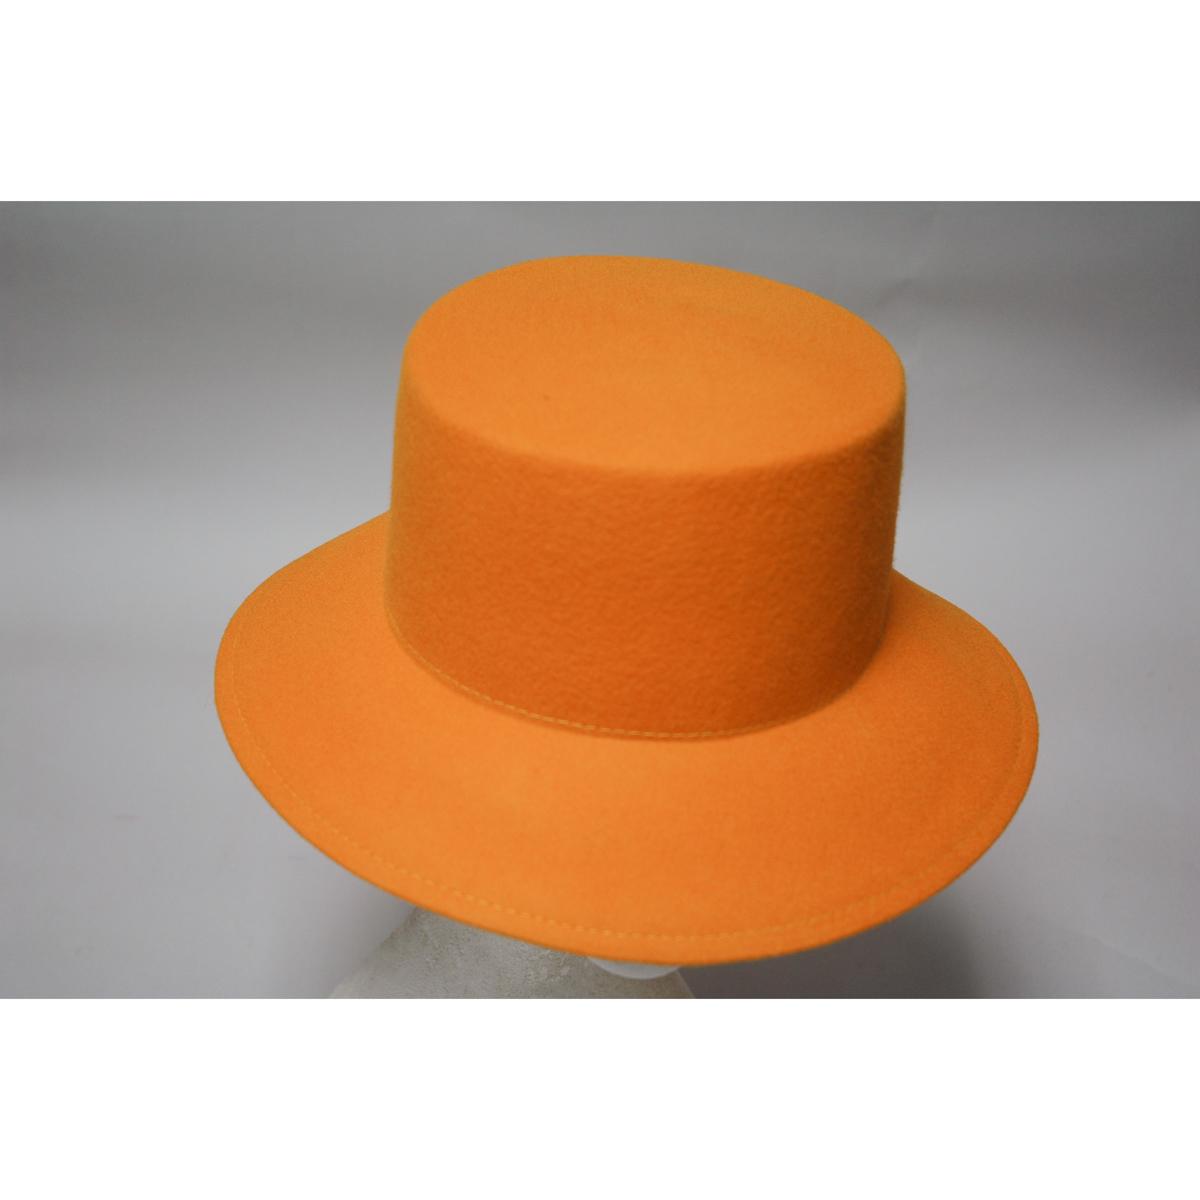 f08ec7af54495 Gold Lampshade Small Brim Flat Top Felt Plain Hats-W0110-GOLD- Sun Yorkos